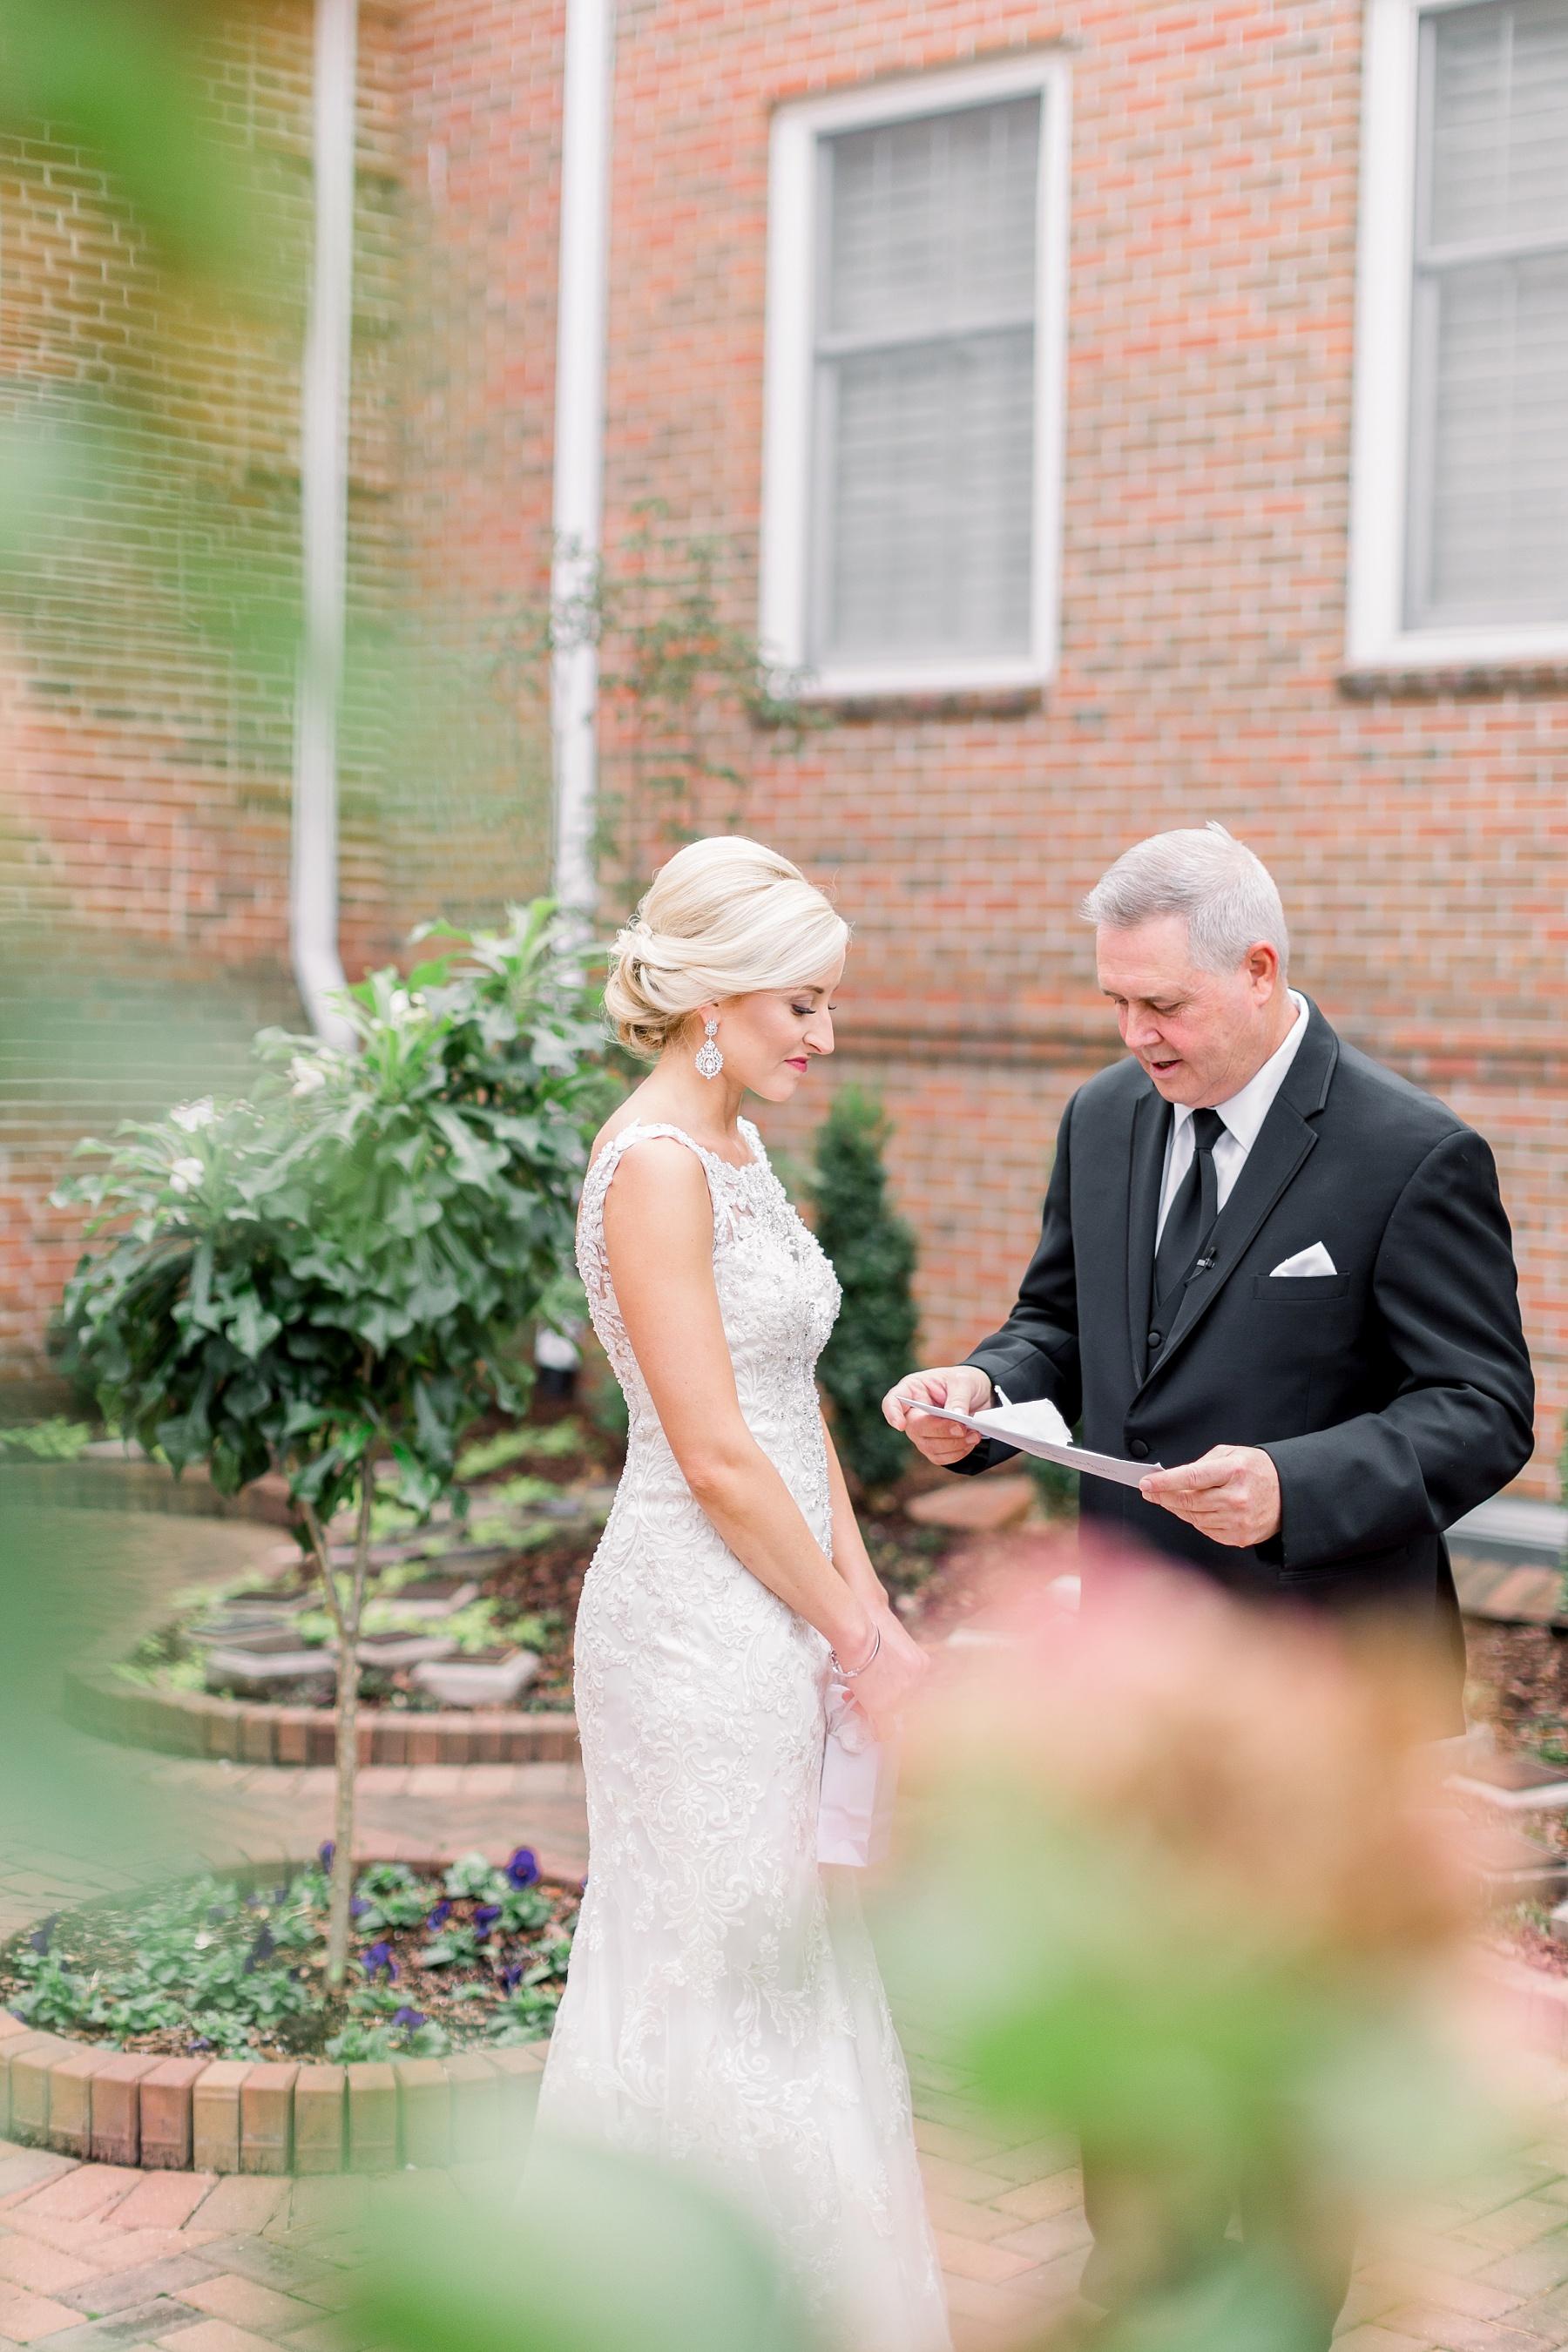 midwest-adventurous-wedding-photographer-elizabeth-ladean-photography-photo_4715.jpg